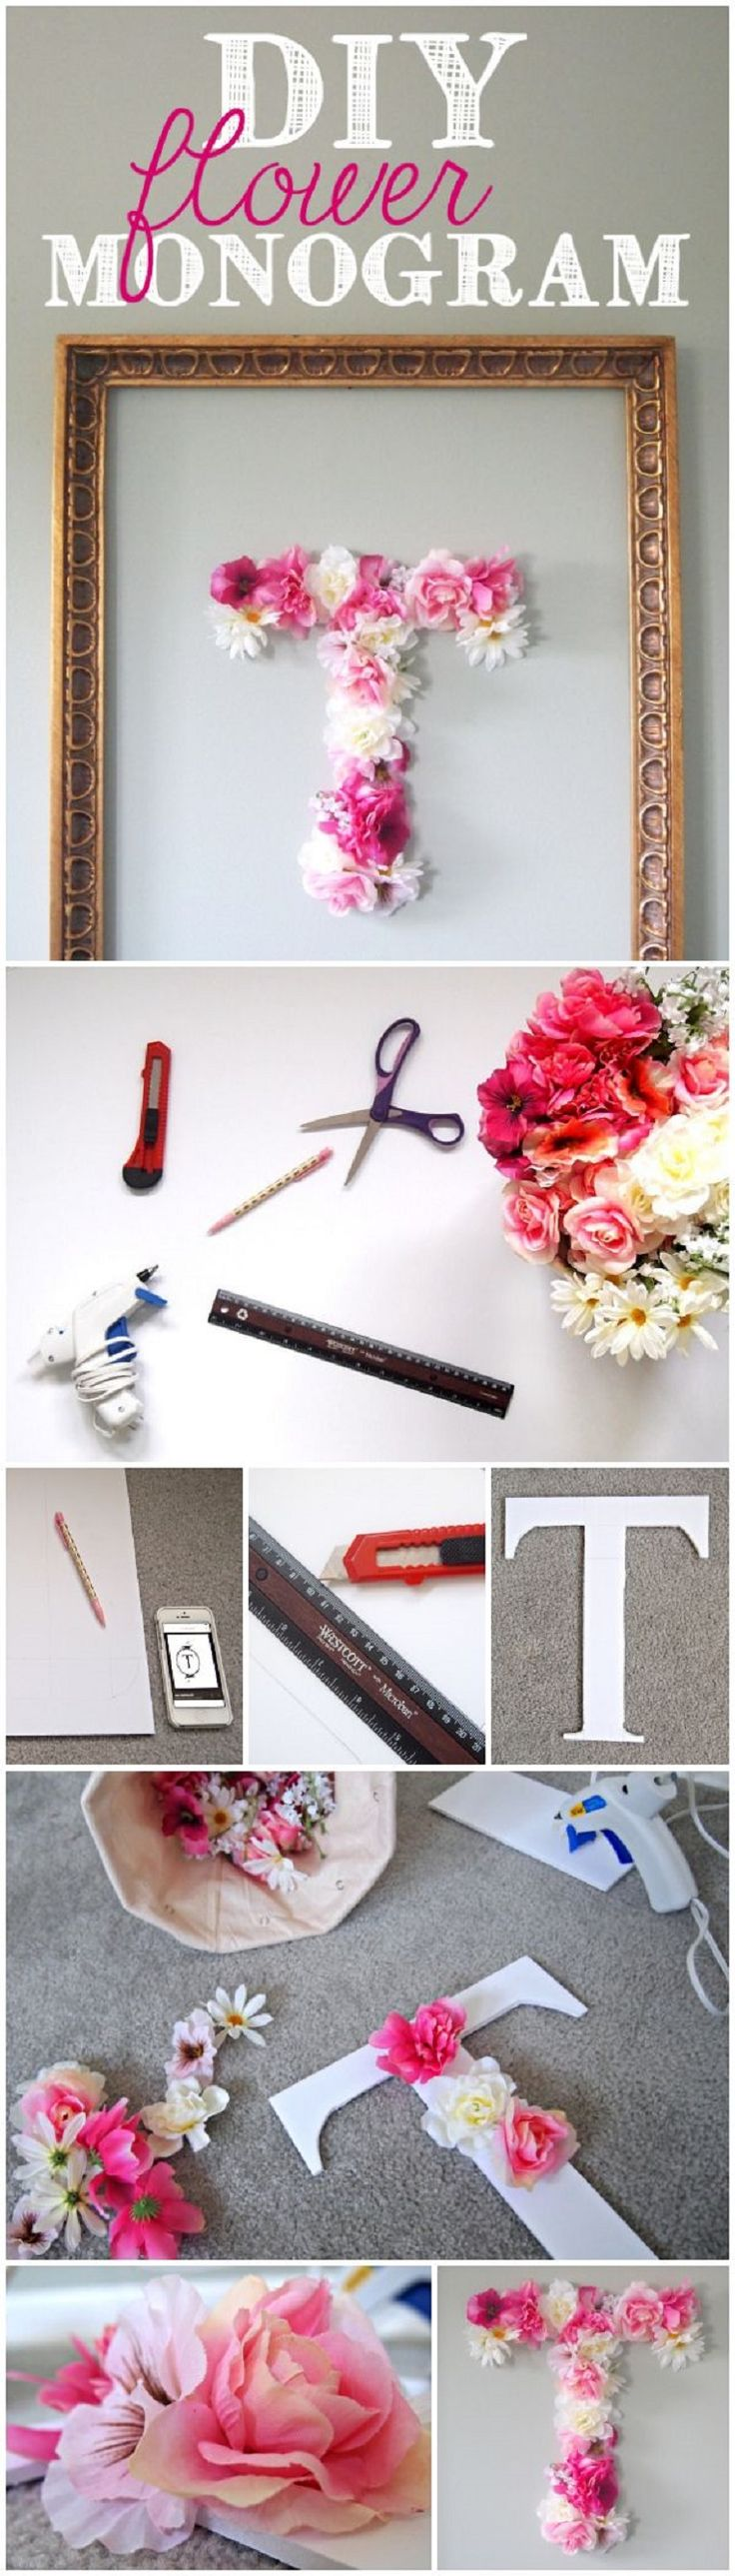 DIY Faux Flower Monogram - 17 Blossoming DIY Spring Decorating Tutorials | GleamItUp